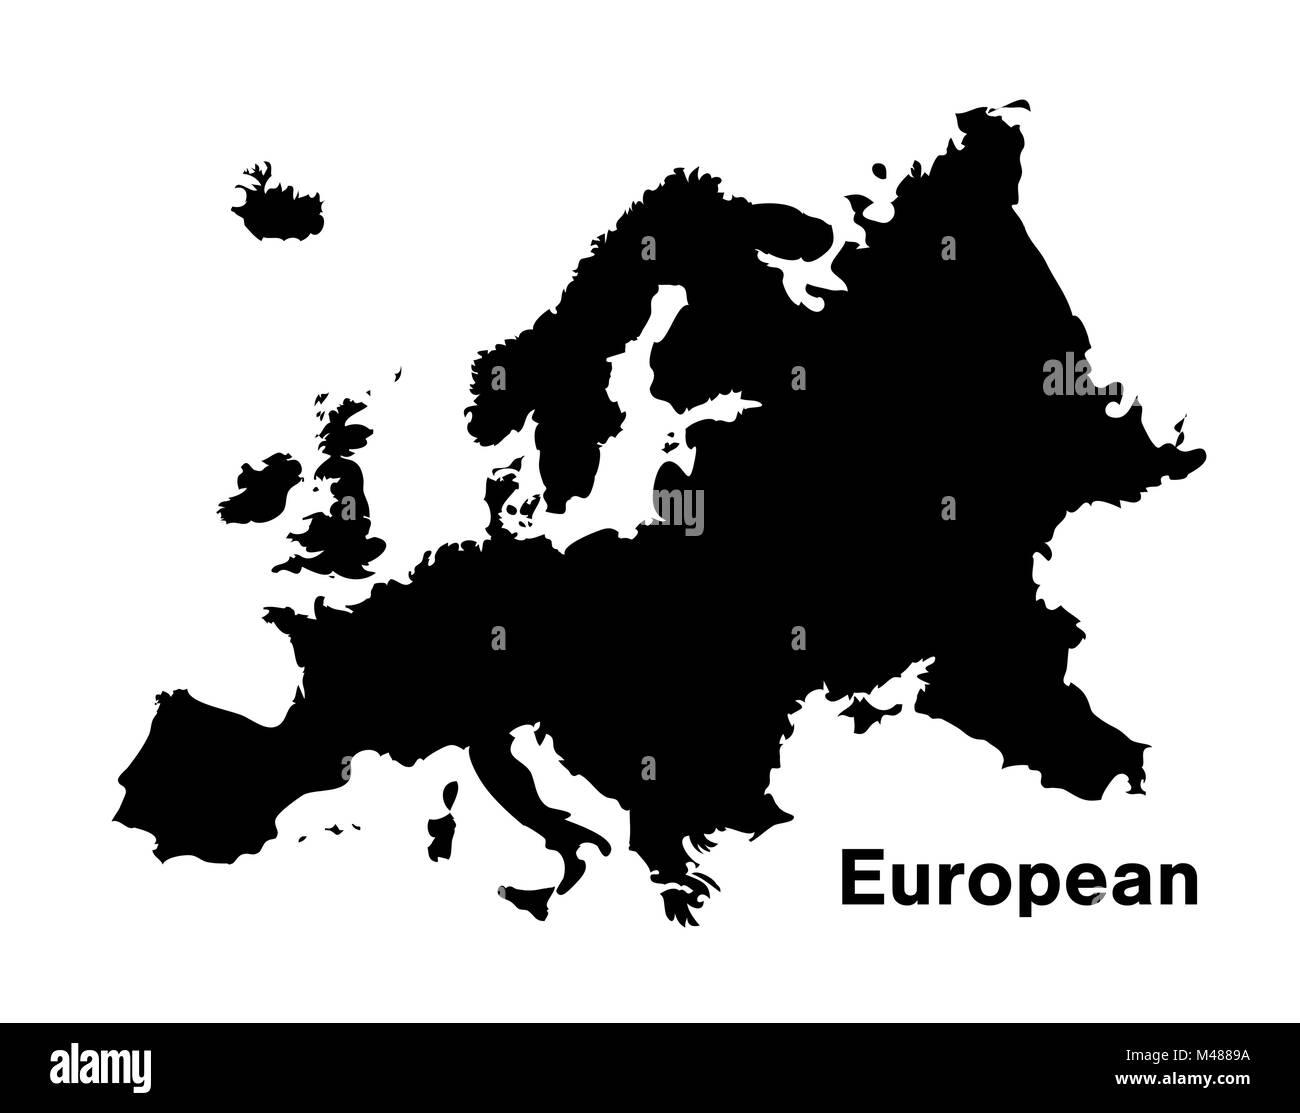 black silhouette european map on white background - Stock Image